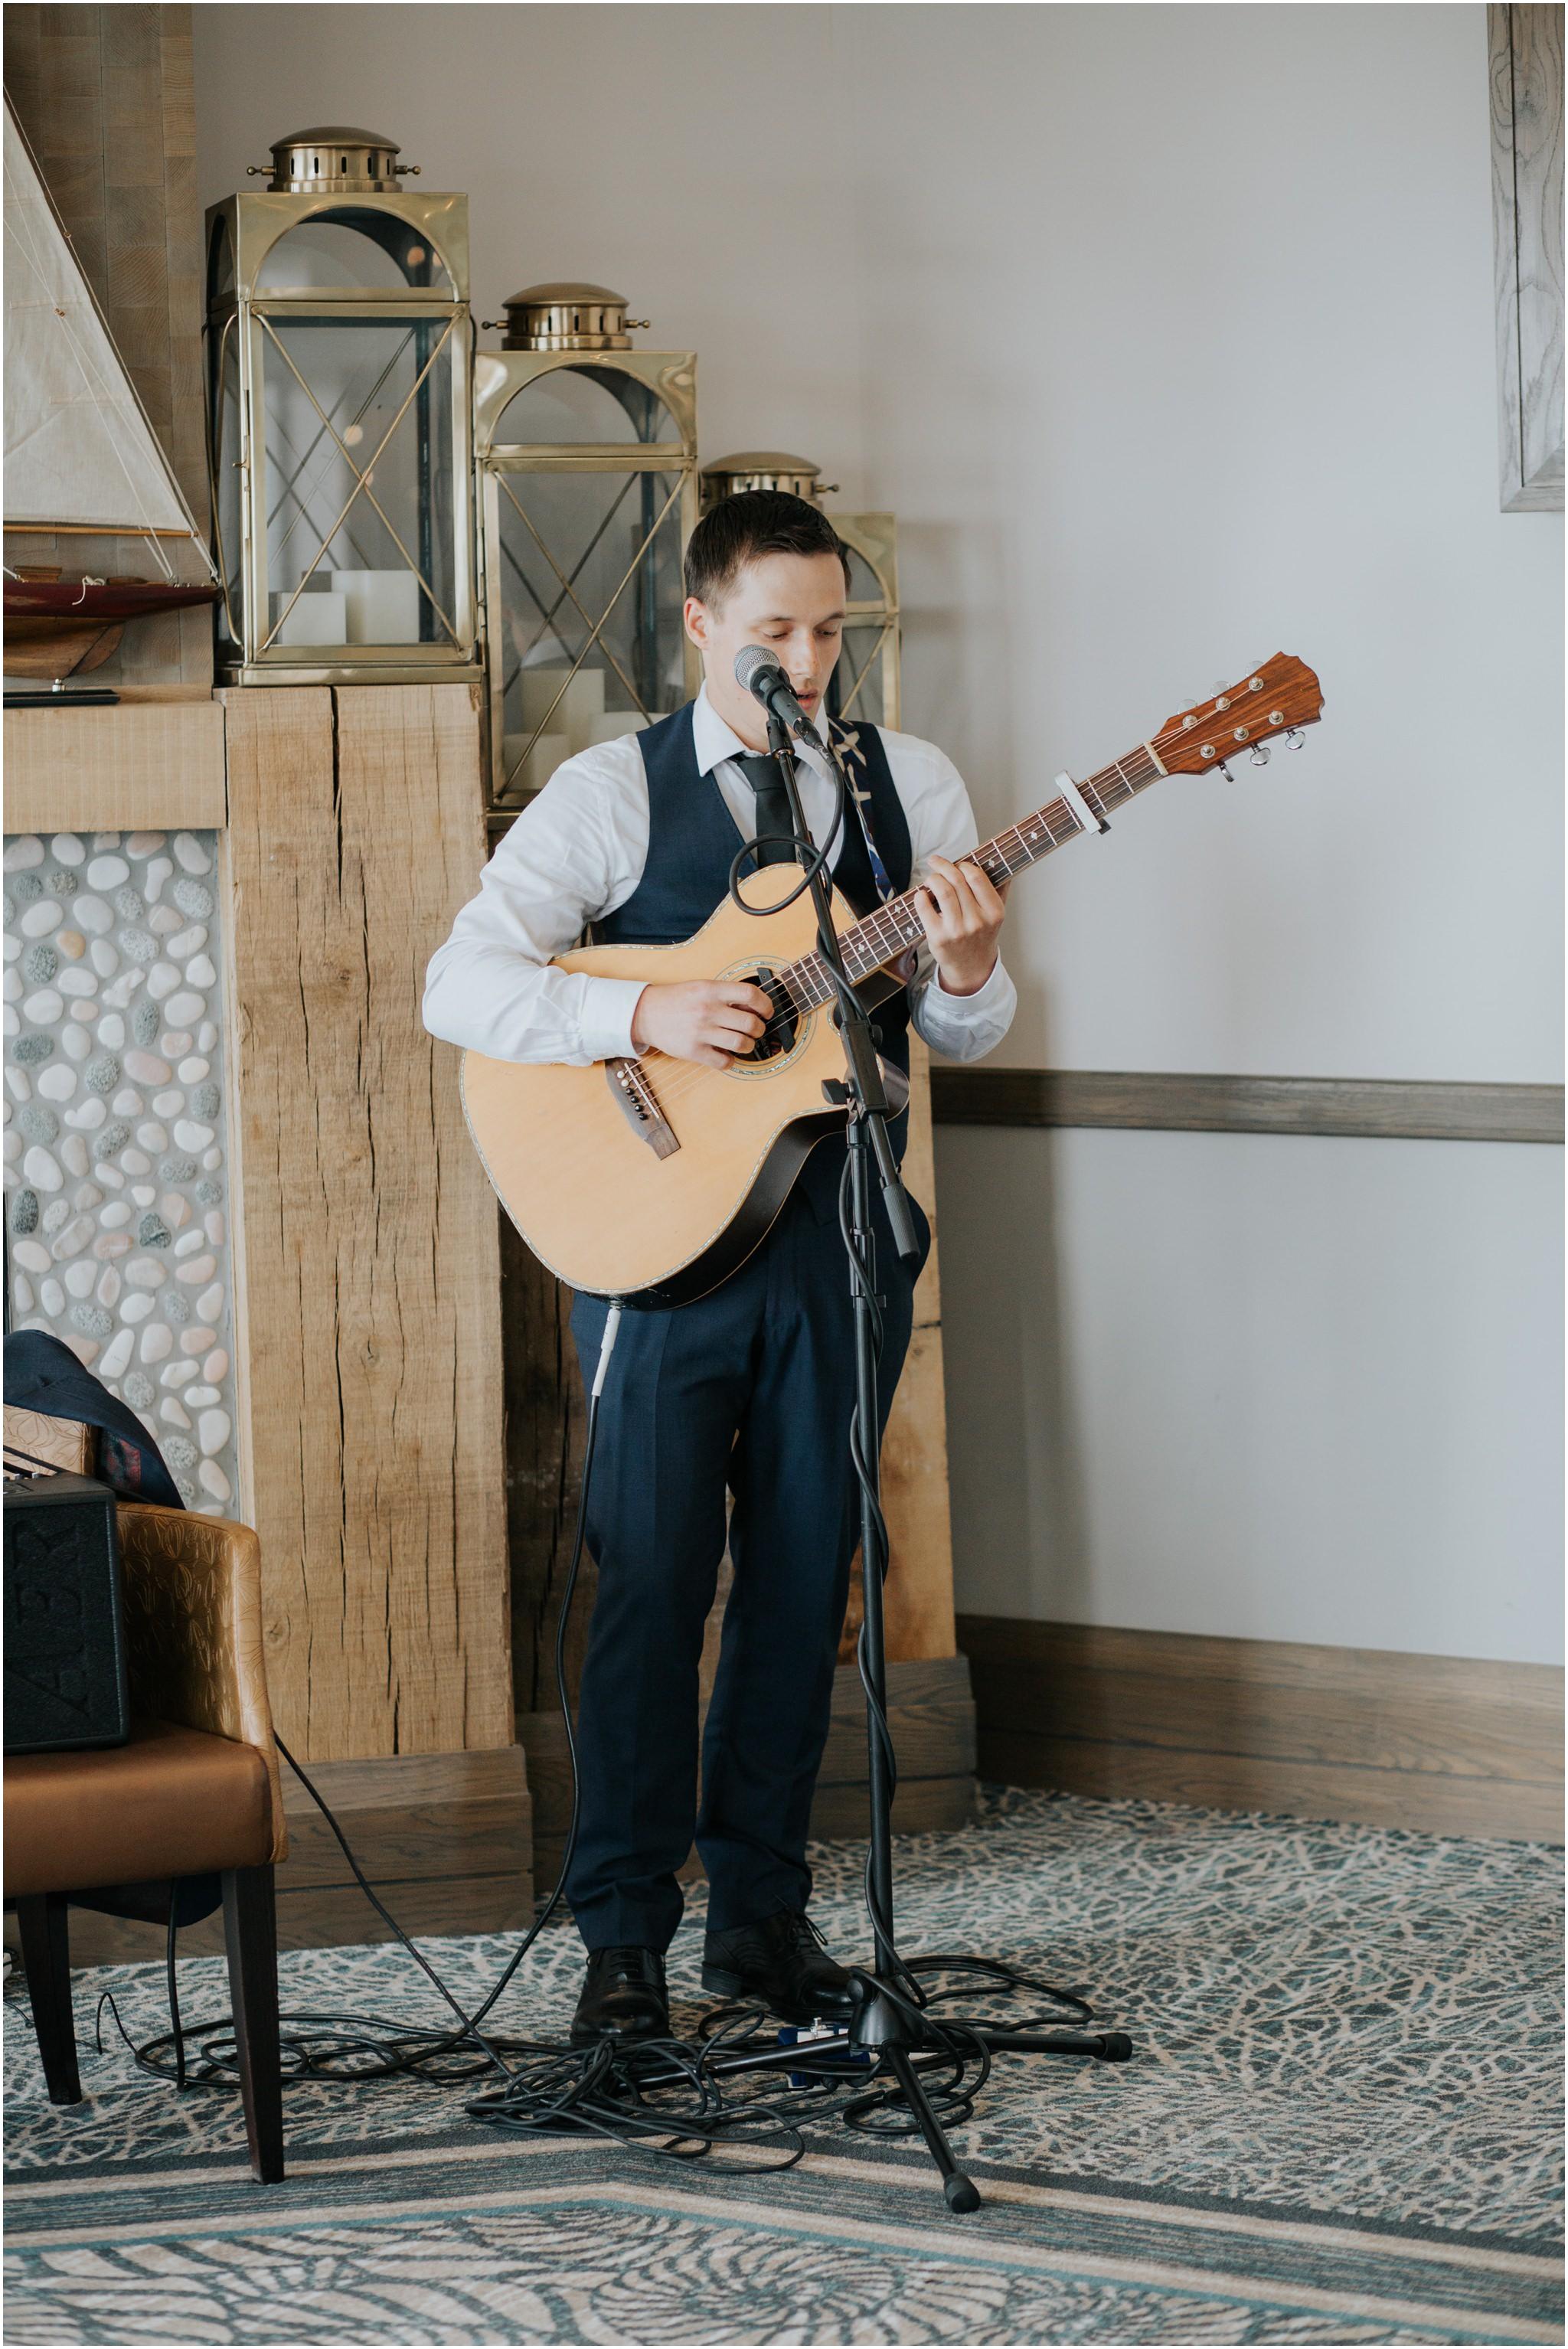 Photography 78 - Glasgow Wedding Photographer - Jordan & Abi - The Waterside Hotel, West Kilbride_0085.jpg